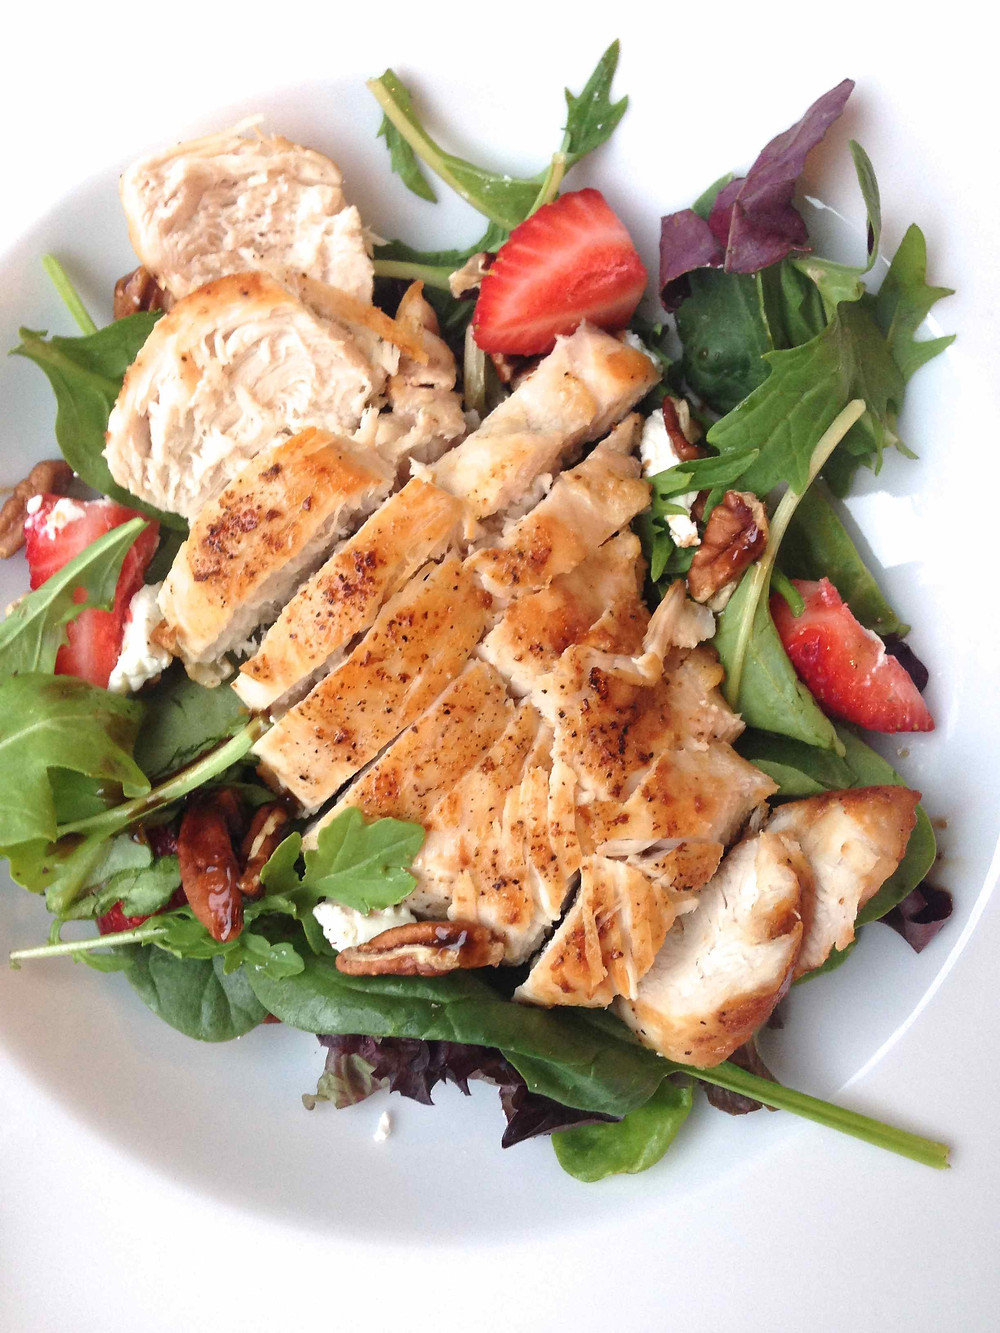 Pan Seared Chicken Salad c2014 TRC 1.jpg